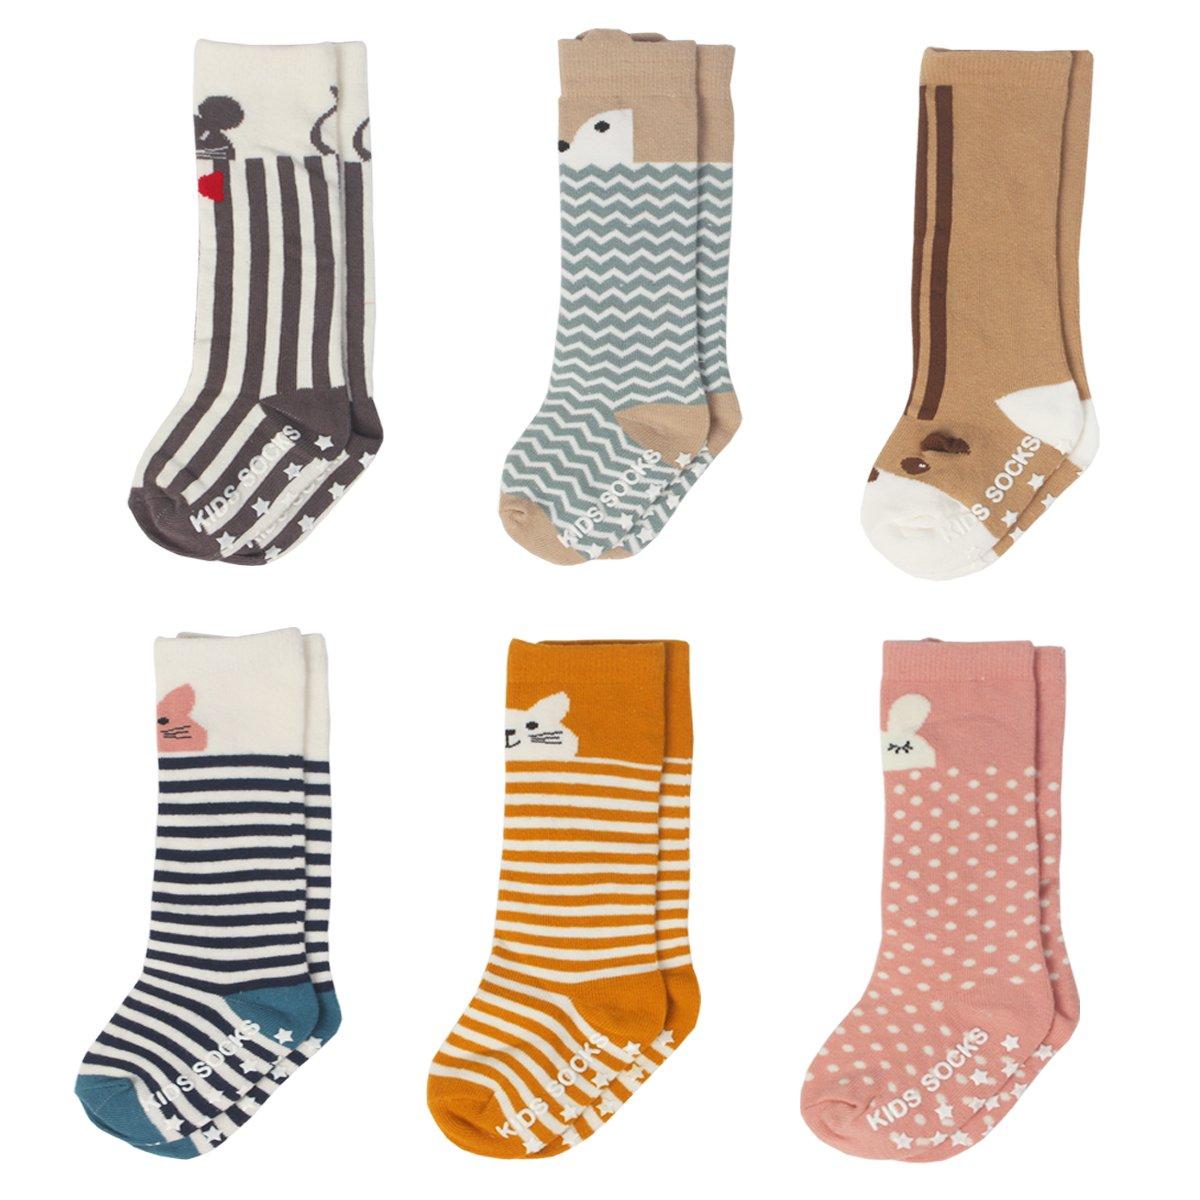 Toddler Socks Non Skid Cotton Knee High Stockings For Boys& Girls leg warmers 6-Pairs